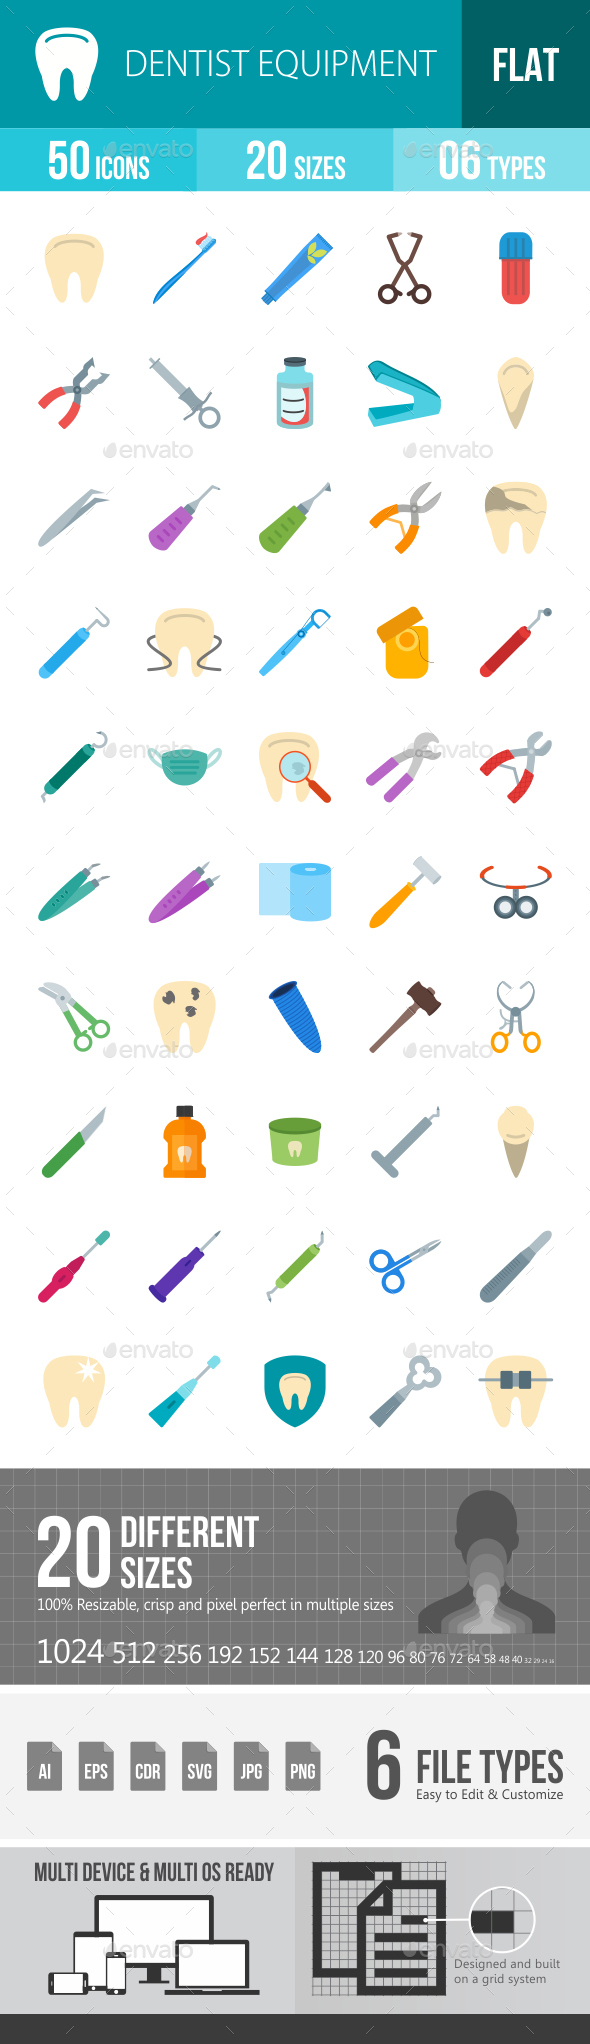 Dentist Equipment Flat Multicolor Icons - Icons